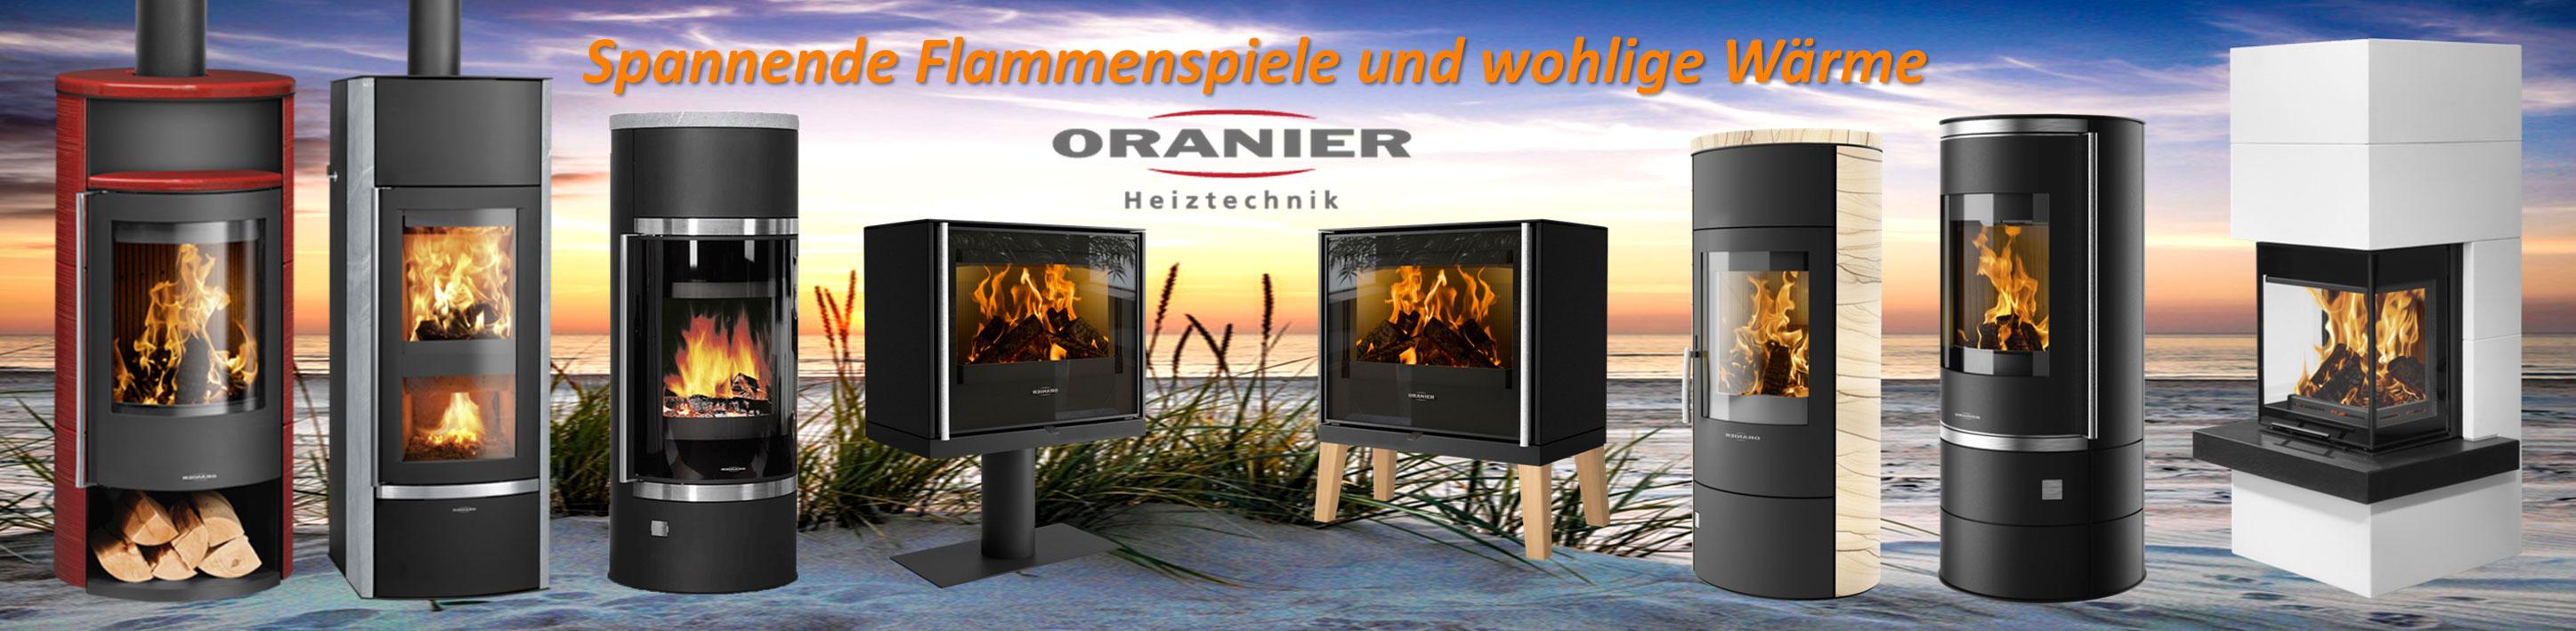 kaminoefen-oranier